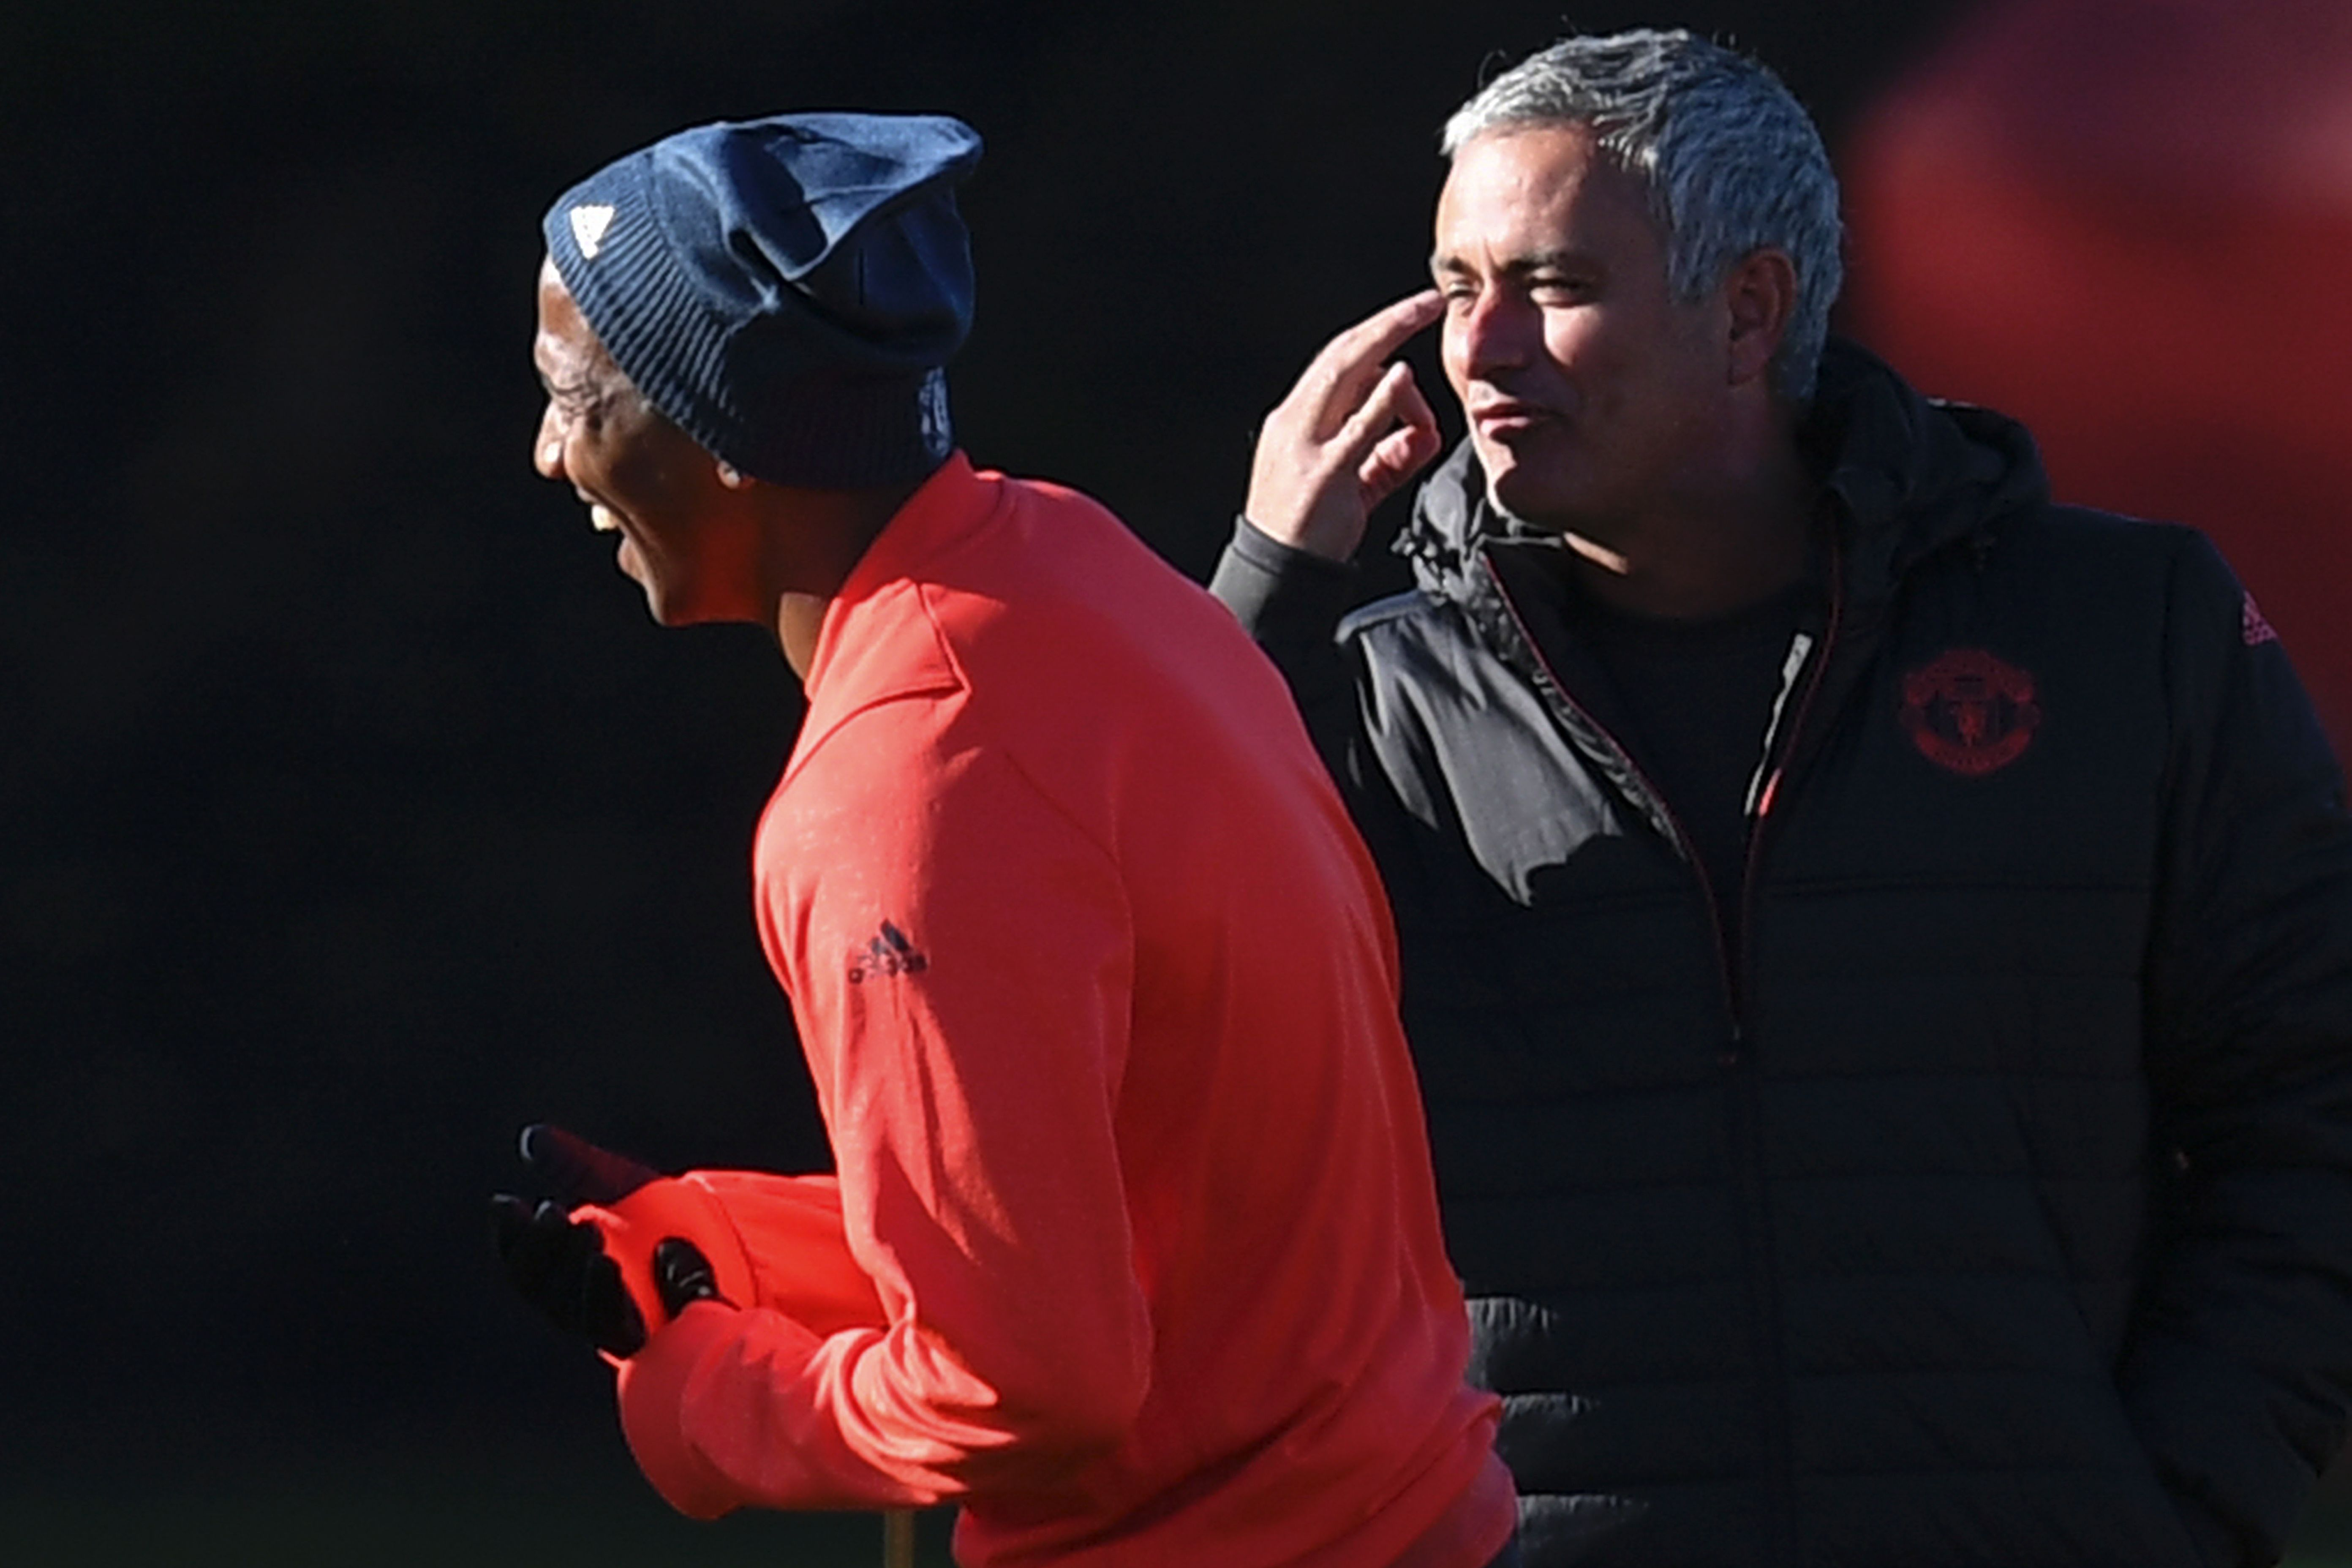 Ashley Young Jose Mourinho Manchester United